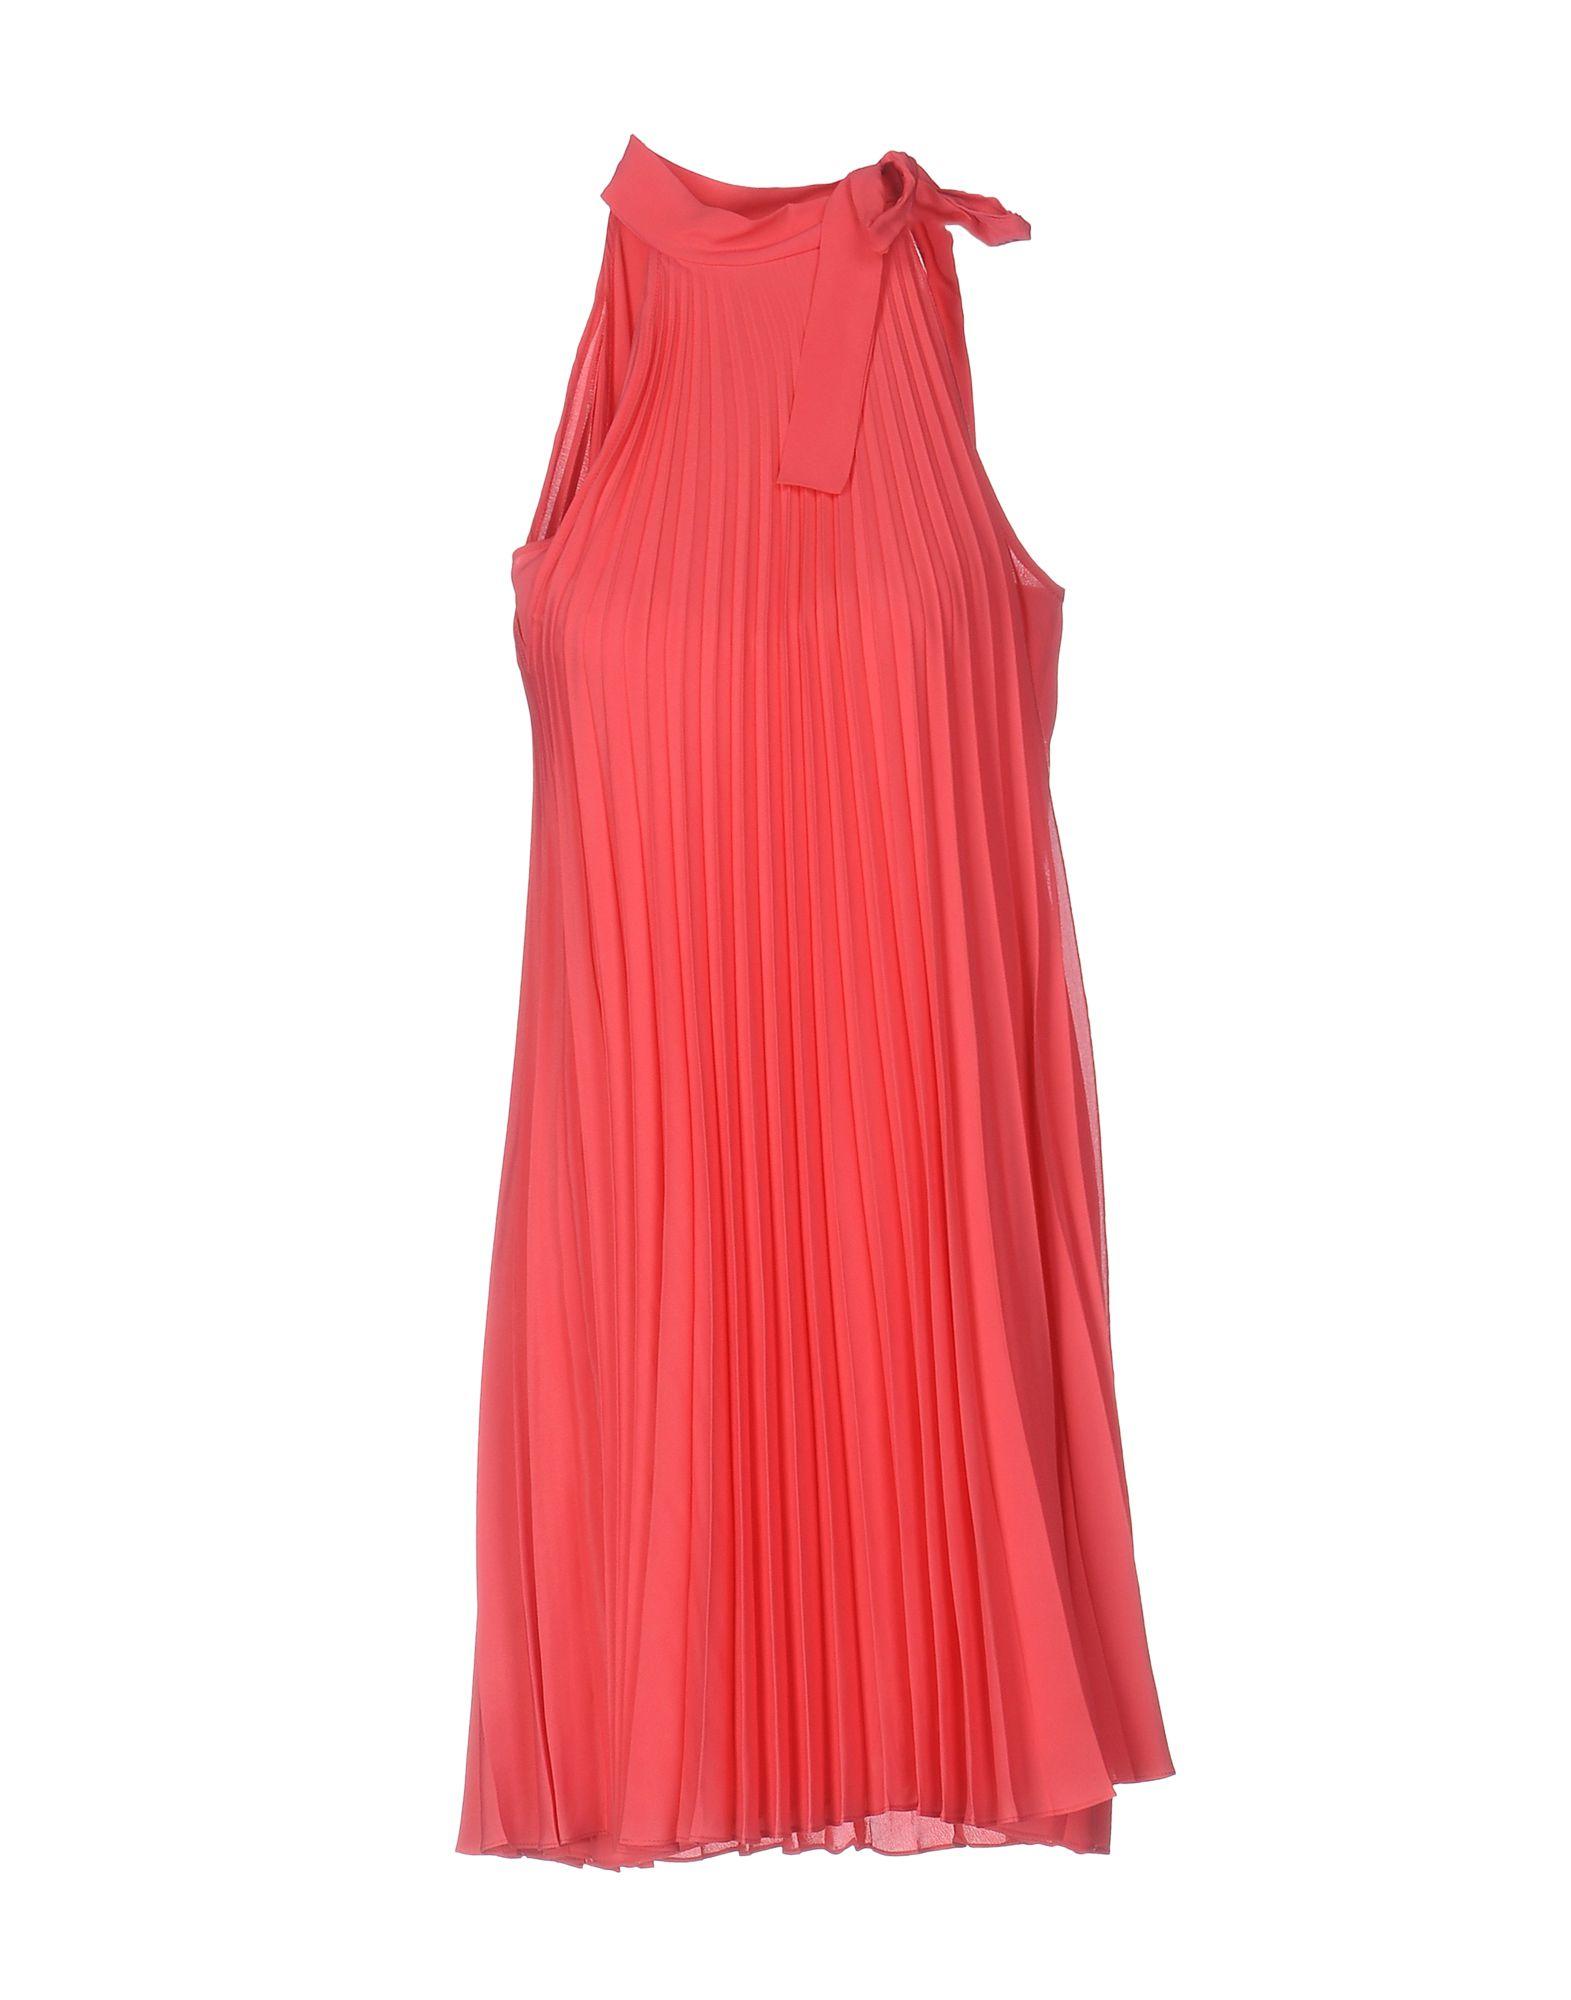 ФОТО 1-one короткое платье